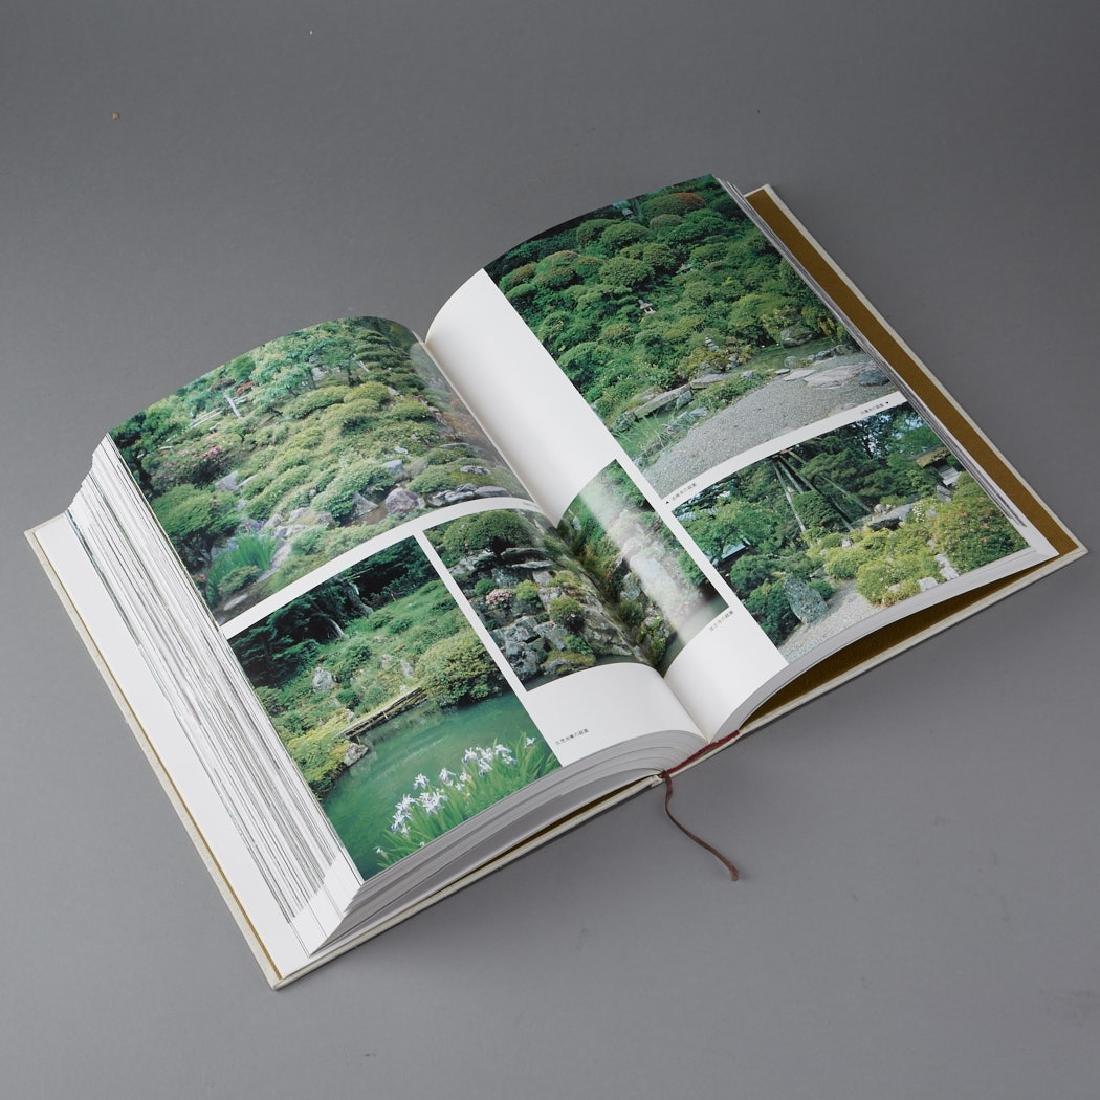 2 Gardening books Nihon No Furui Teien Japanese - 3